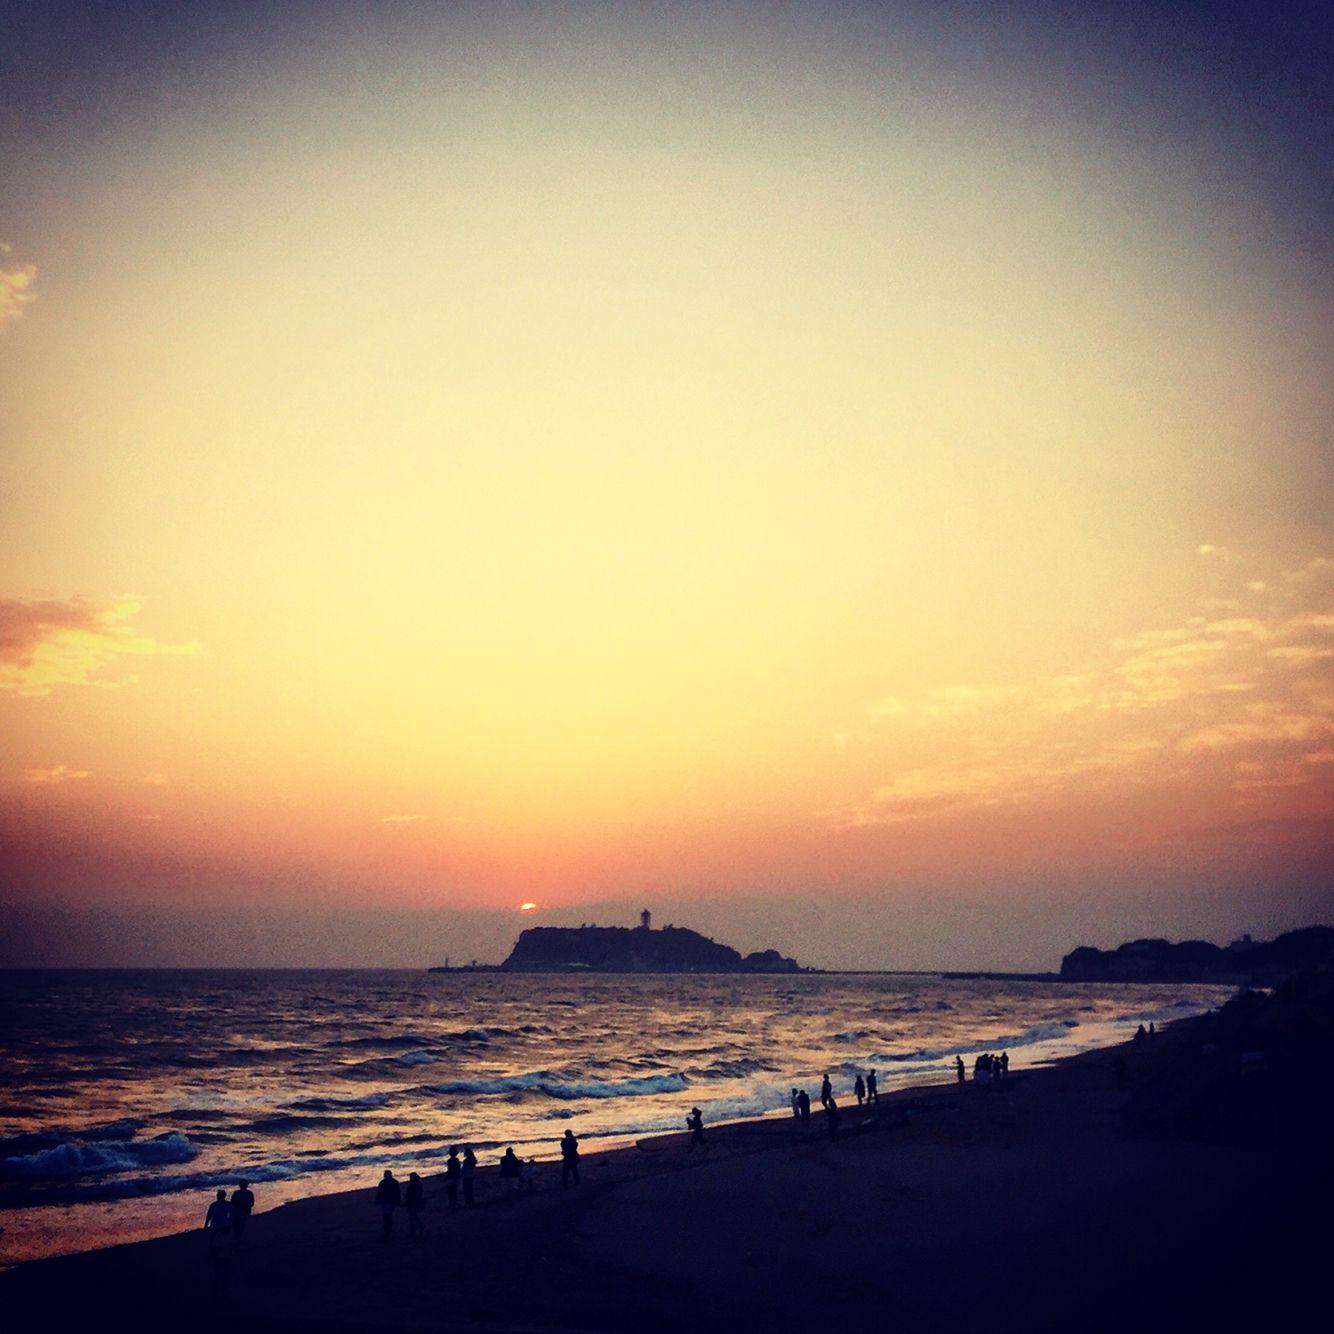 #shichirigahama #kamakura #shonan #japan #surfpoint #goodwave #swell #beach #bythesea #sunrise #sunset #Instagrame @8s